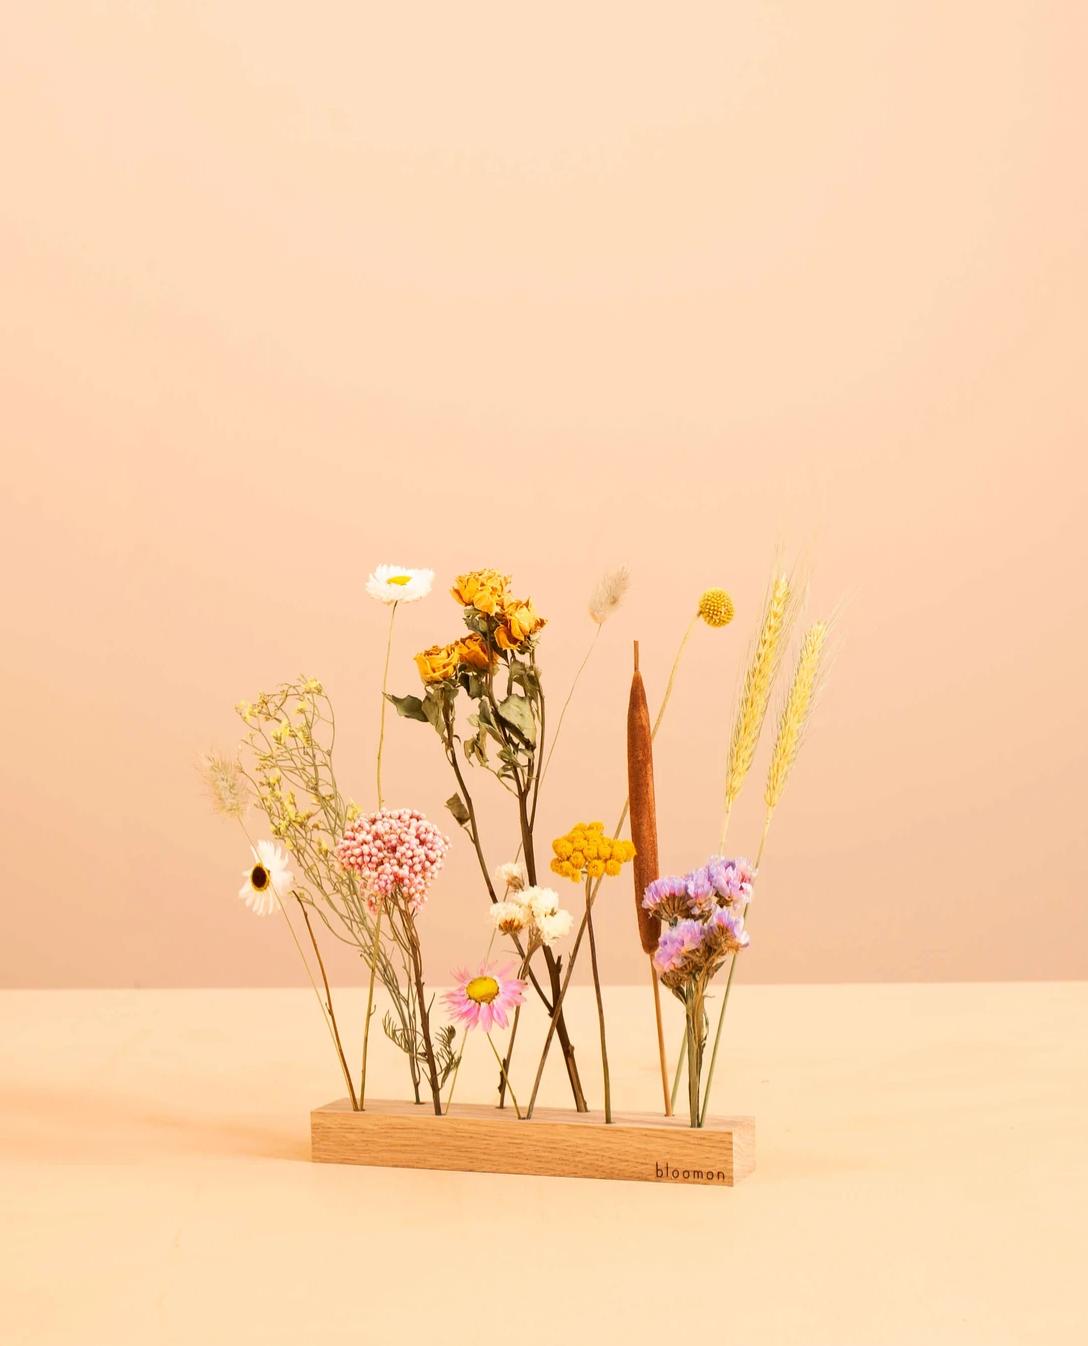 Flowergram Pastel Blonde - Bloomon-2